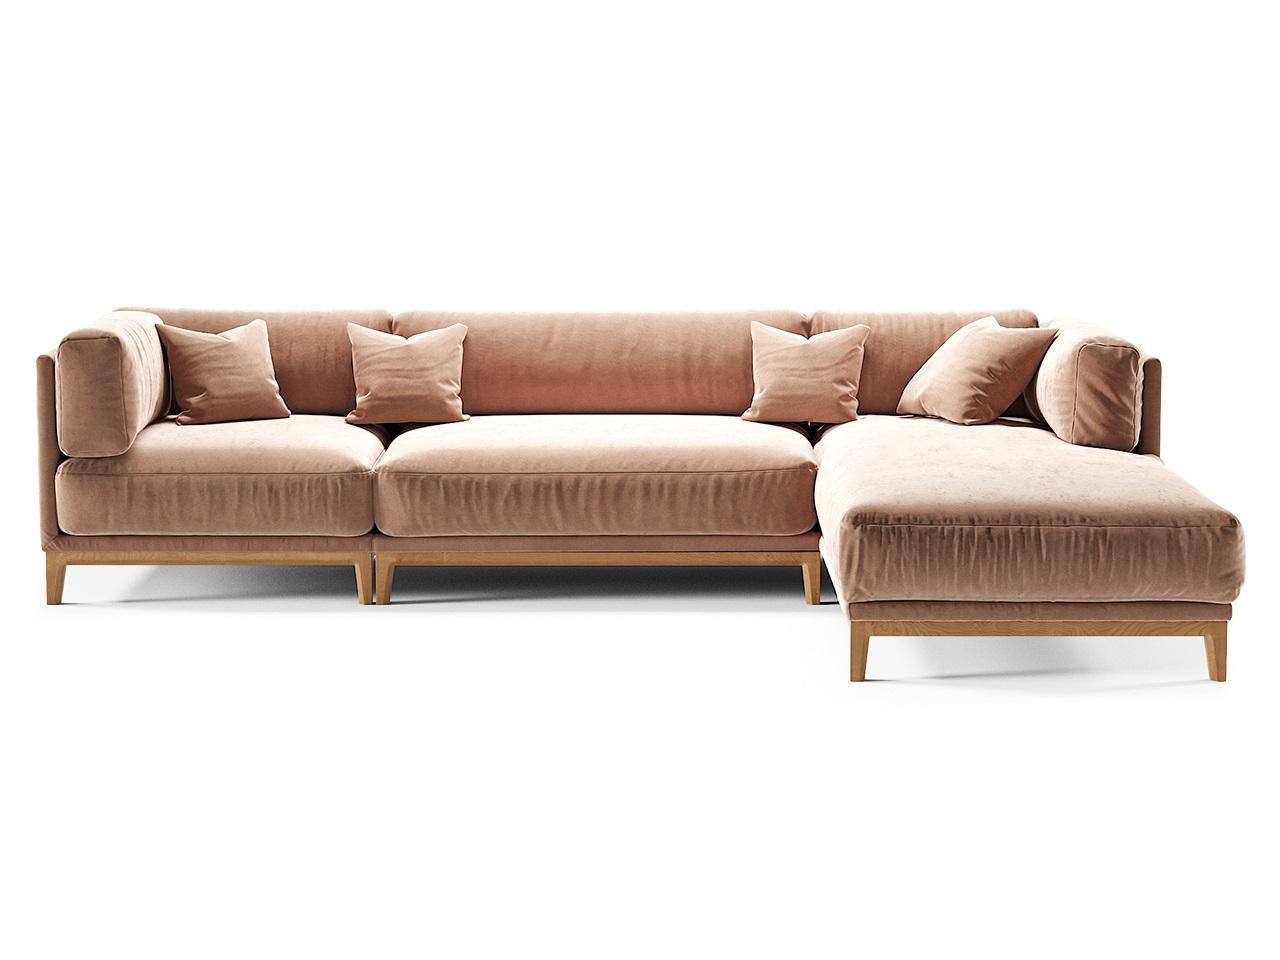 The idea диван case бежевый 81070/1